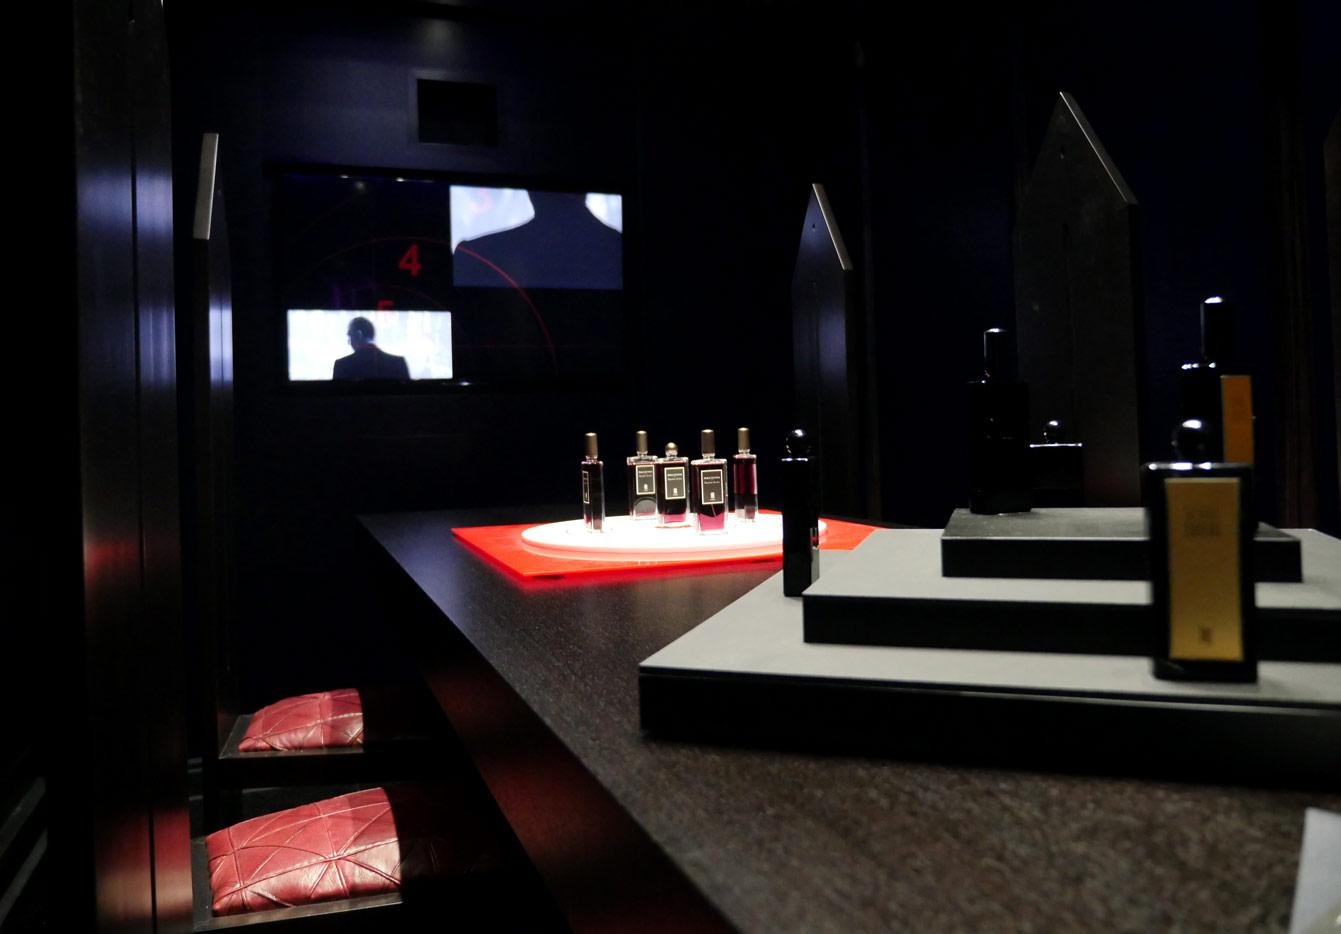 serge-lutens-espace-palais-royal-11